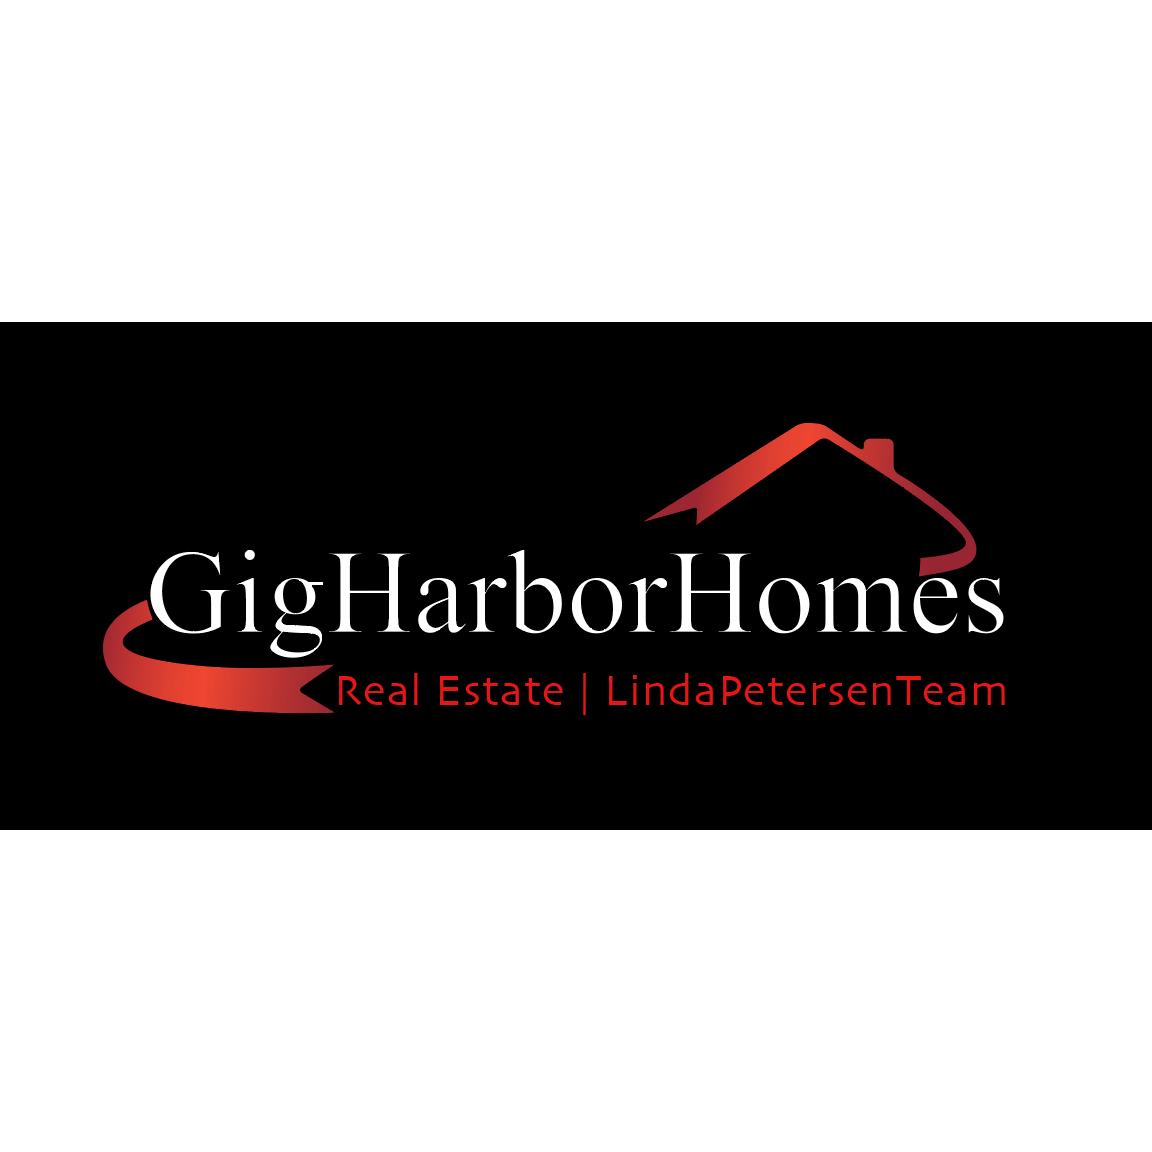 Gig Harbor Homes